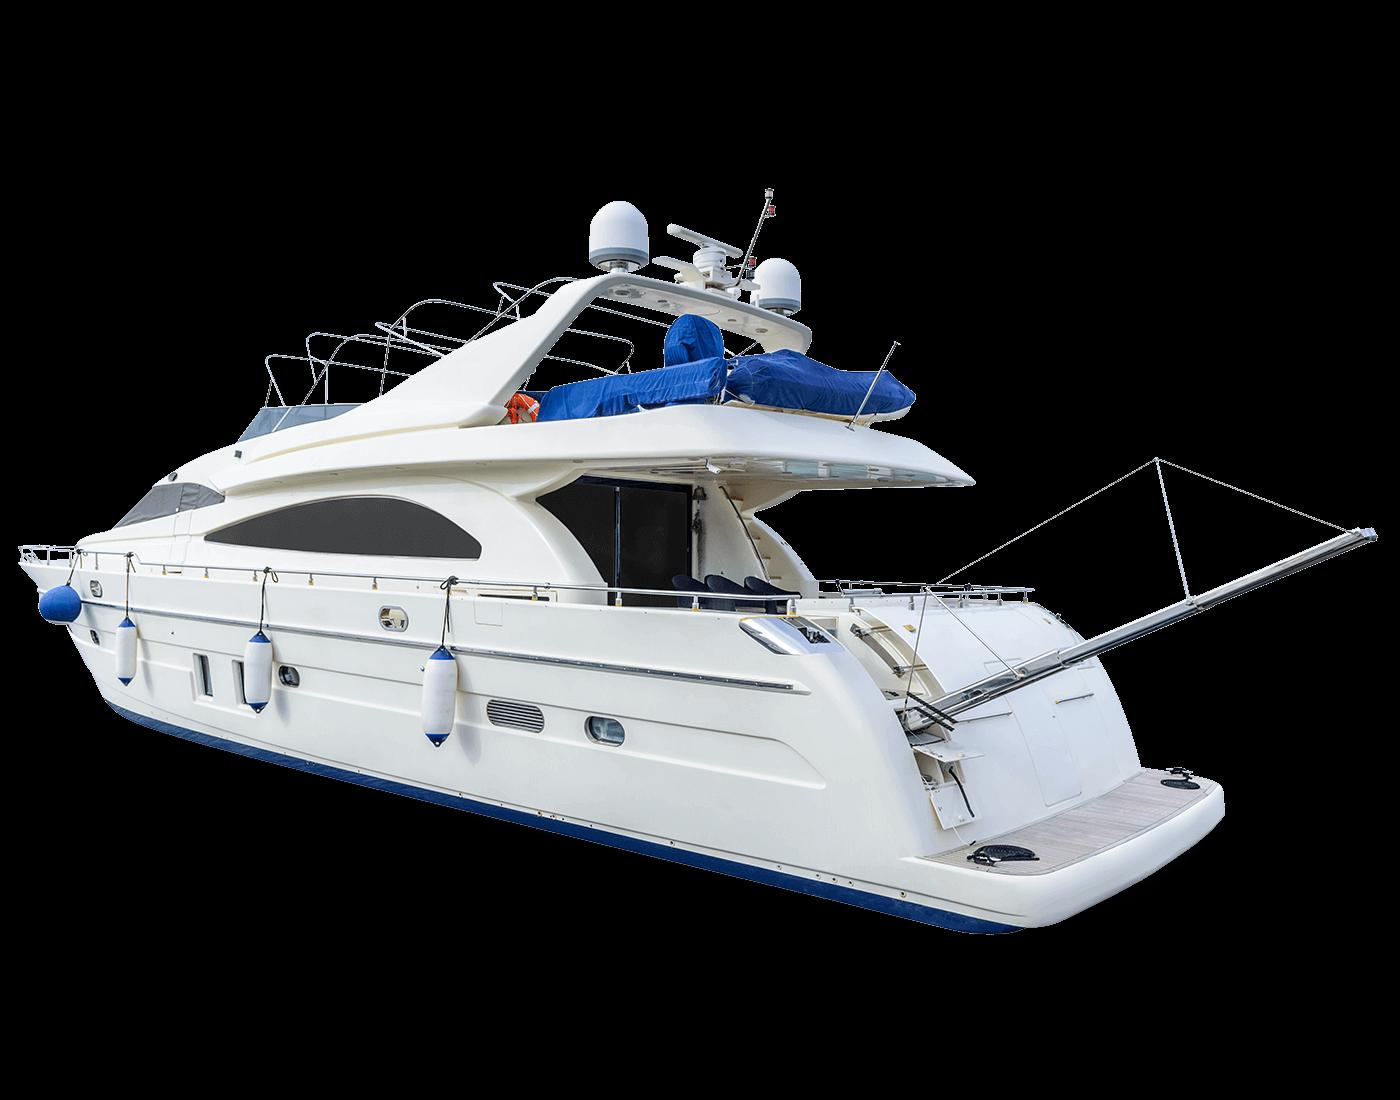 Spedizione yacht